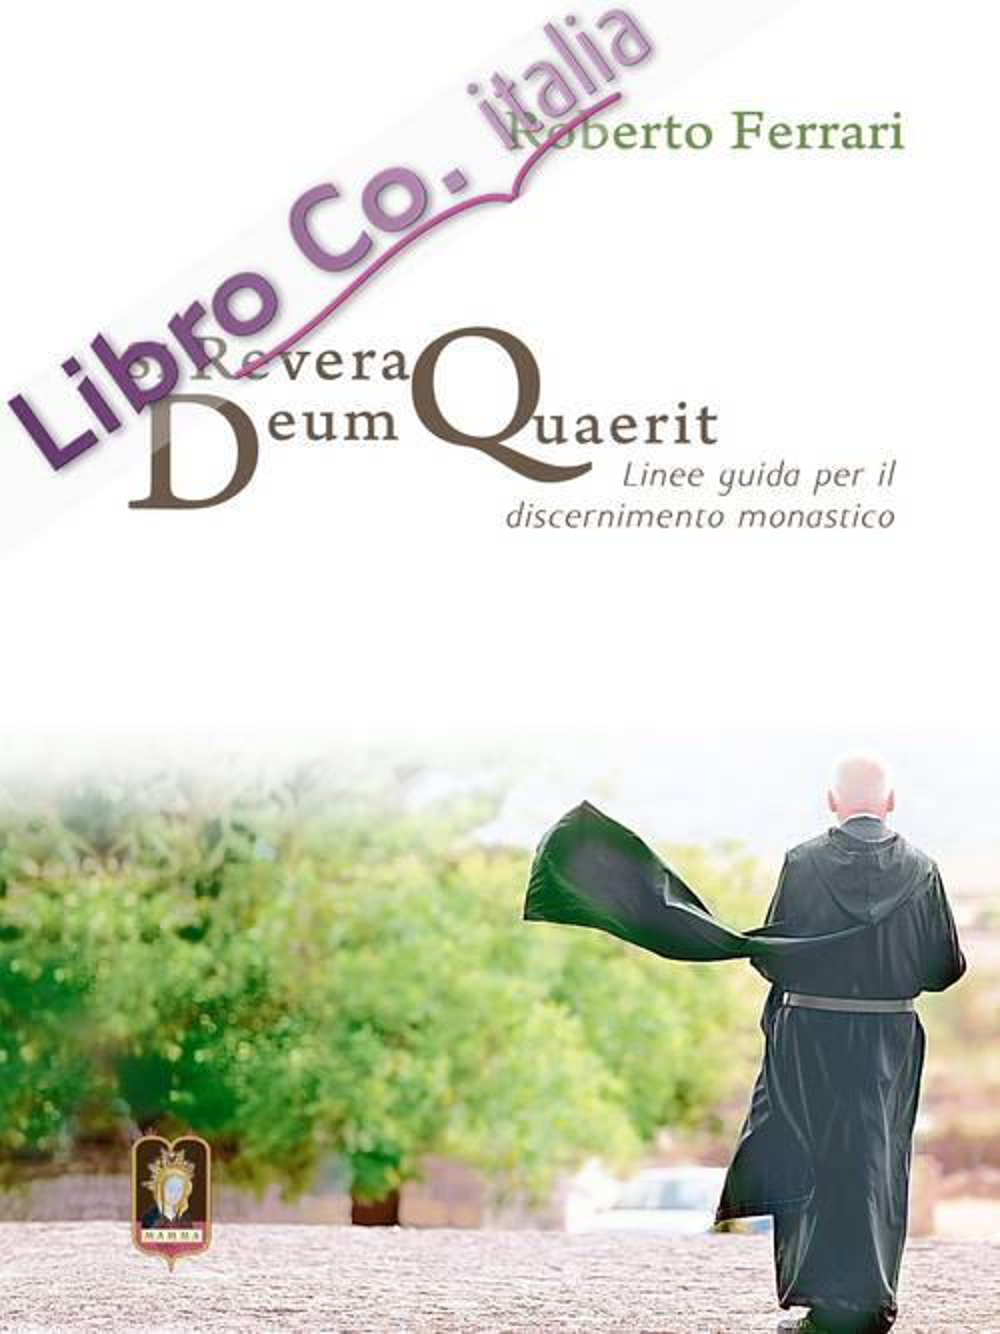 Si revera Deum quaerit. Linee guida per il discernimento monastico